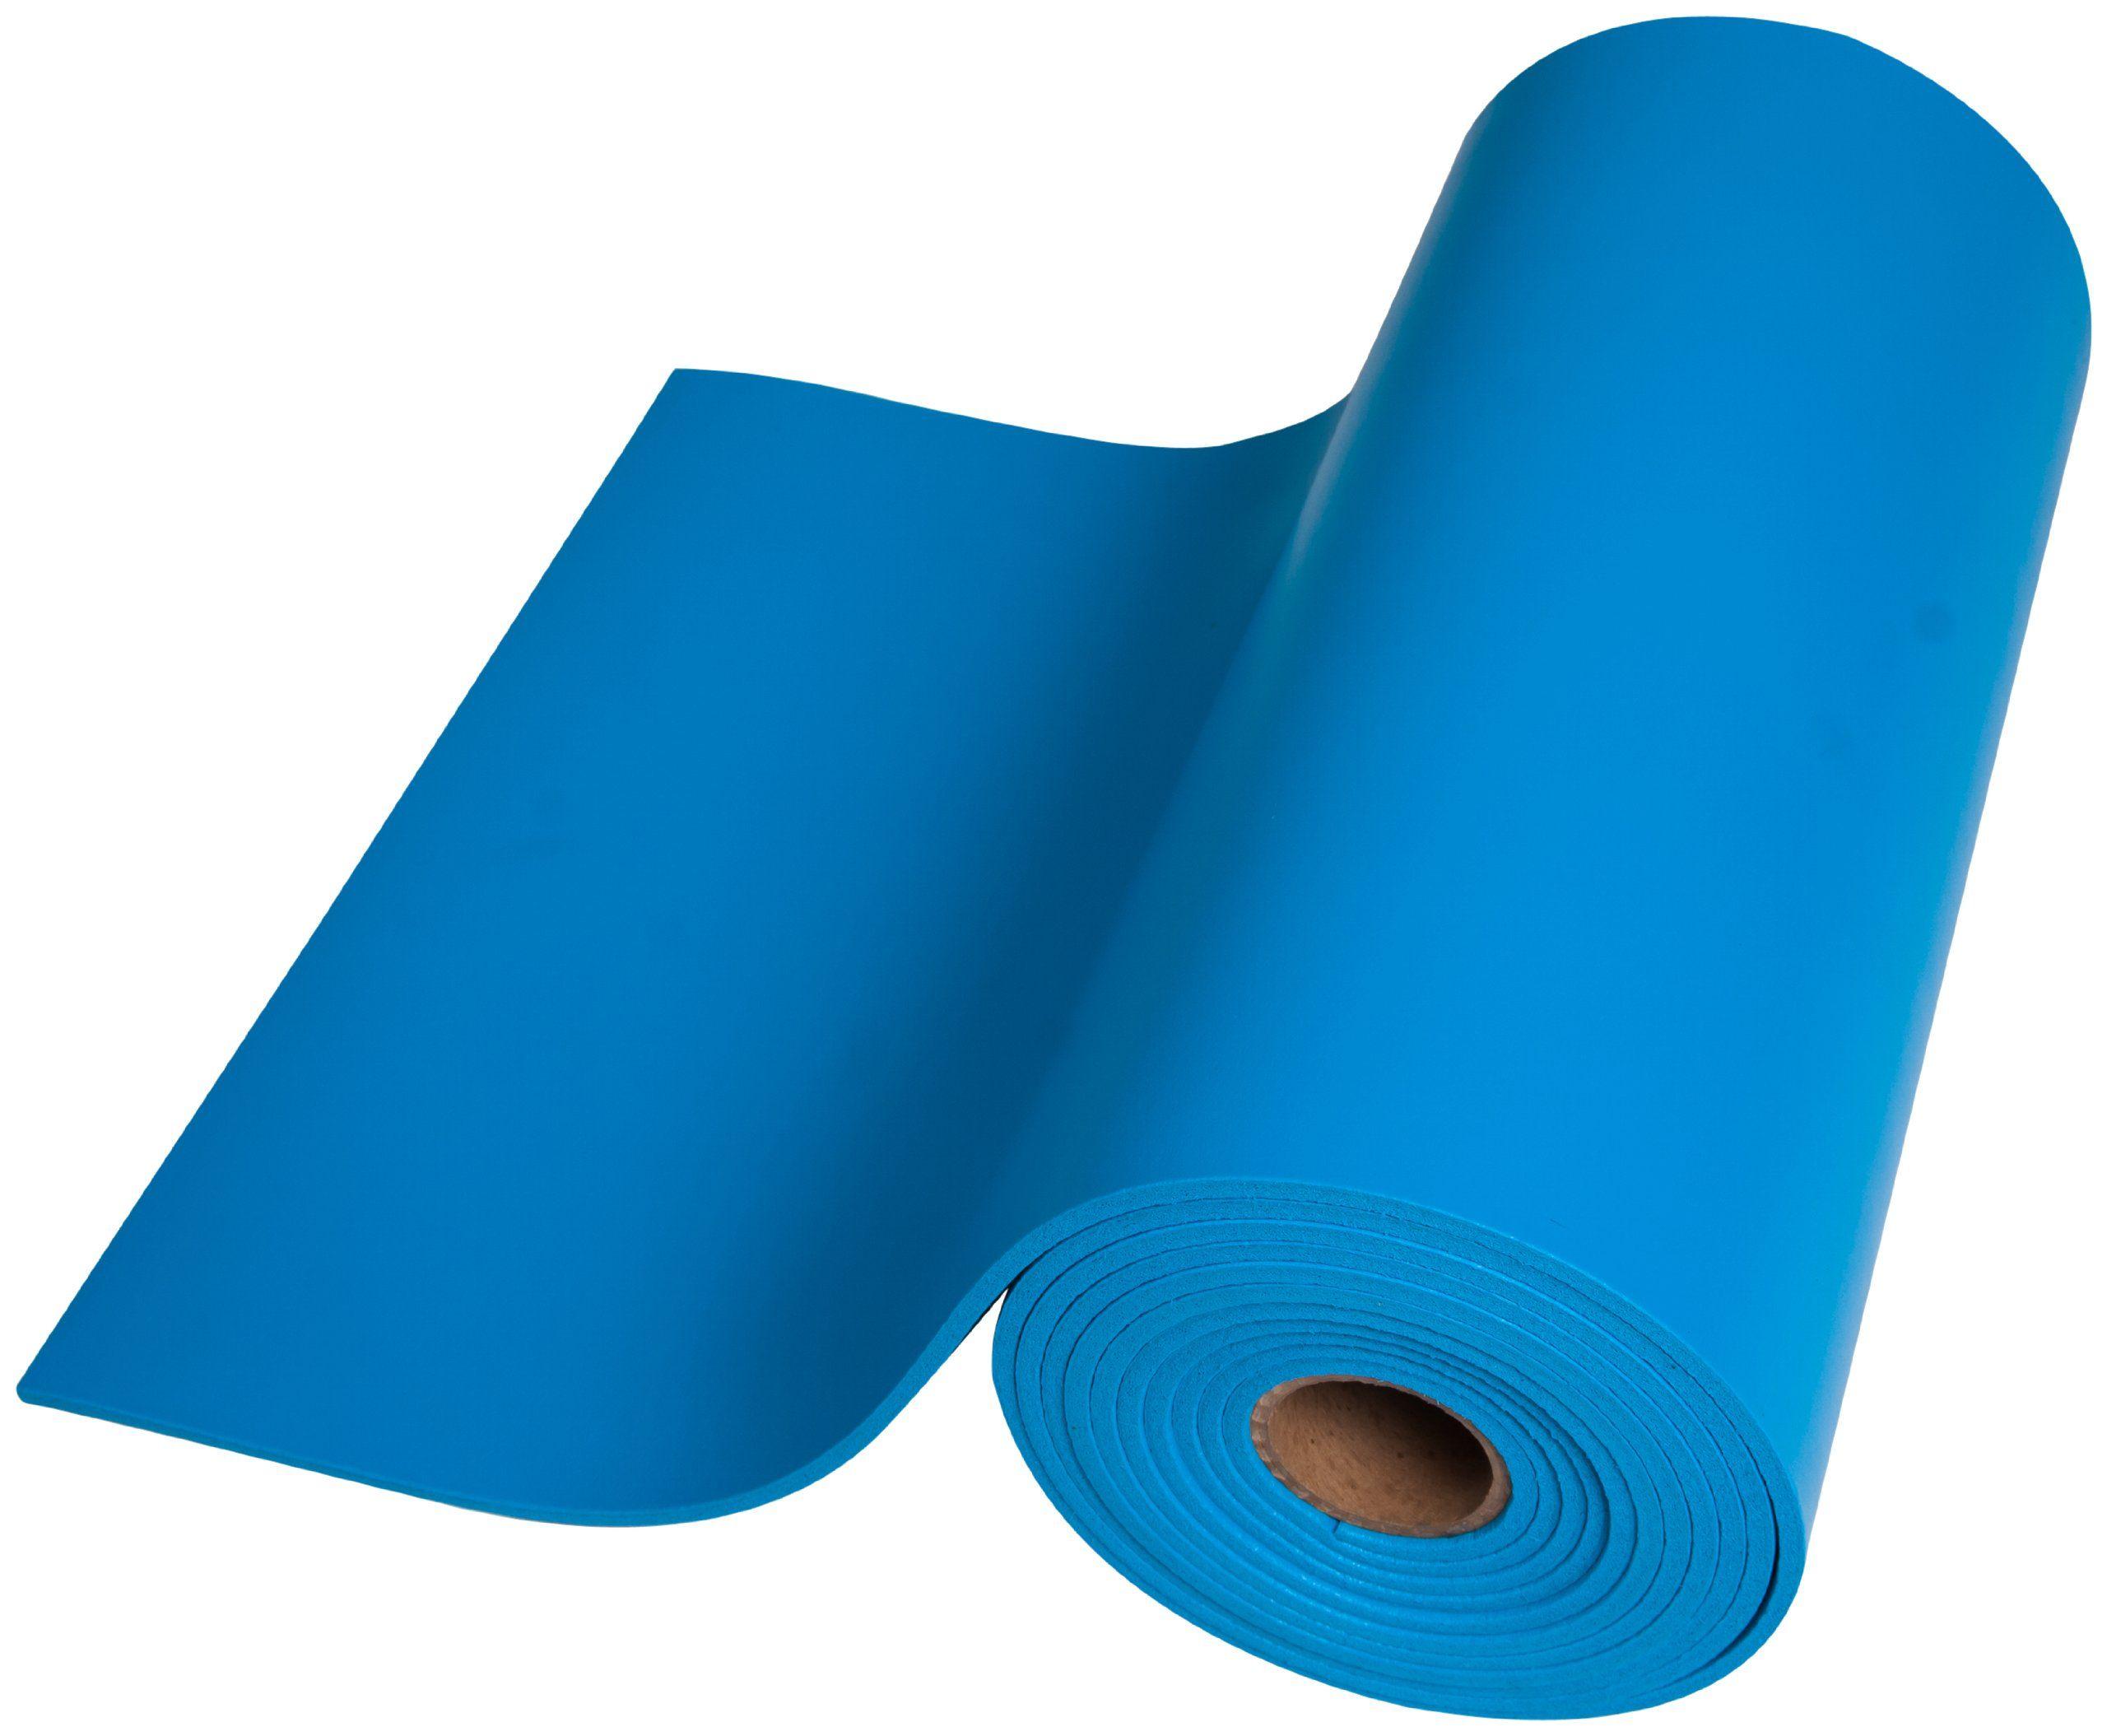 Esdproduct Pvc Foam Mat Roll 3 8 Thick 30 Length 2 1 2 Width Blue Foam Mats Foam Pvc